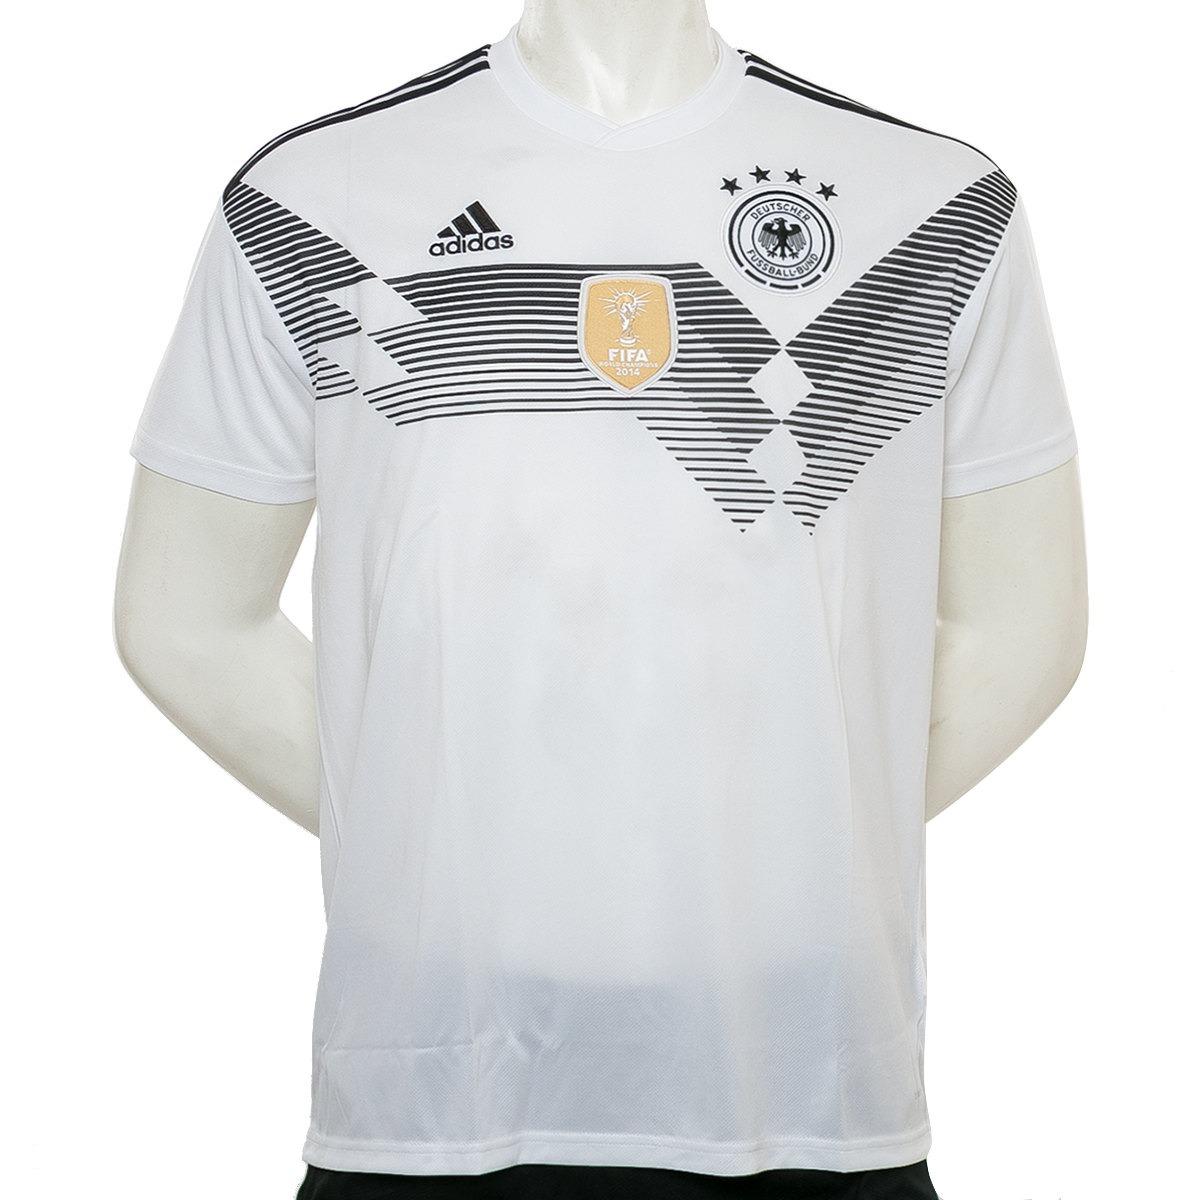 4b1b030463cc1 camiseta alemania dfb home adidas adidas tienda oficial. Cargando zoom.